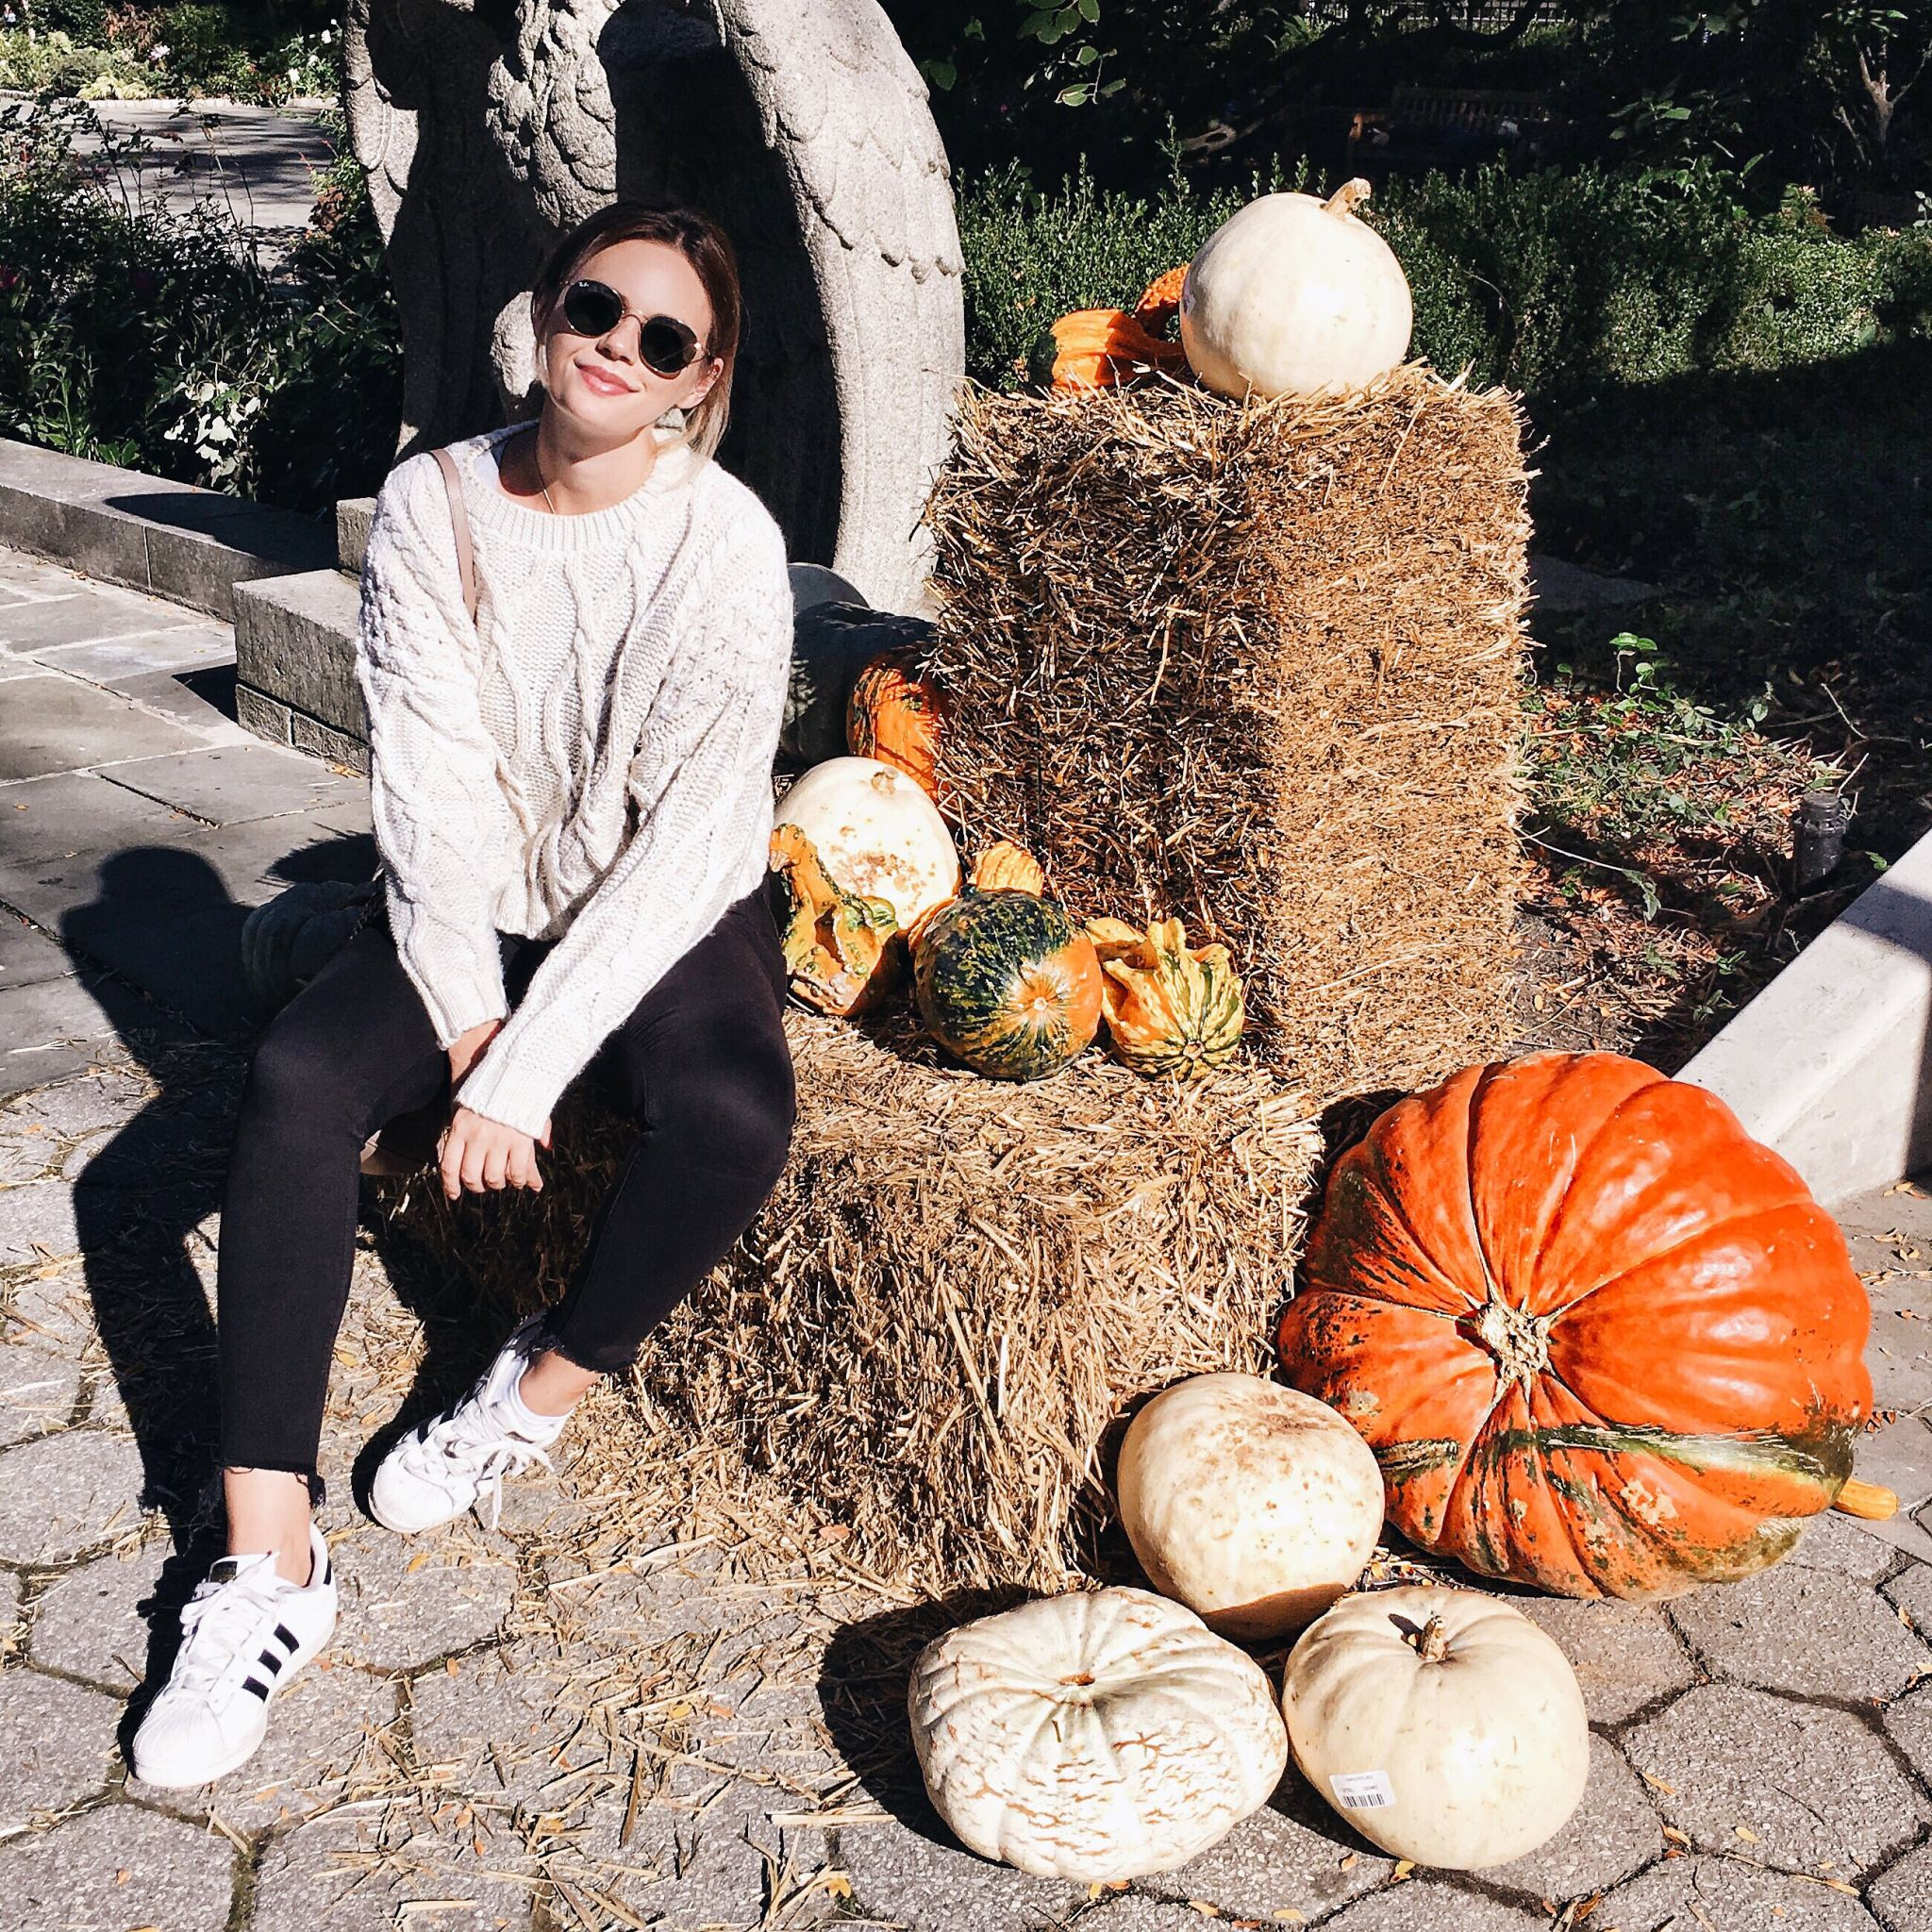 New york cocoa chelsea jesschamilton pumpkins central park